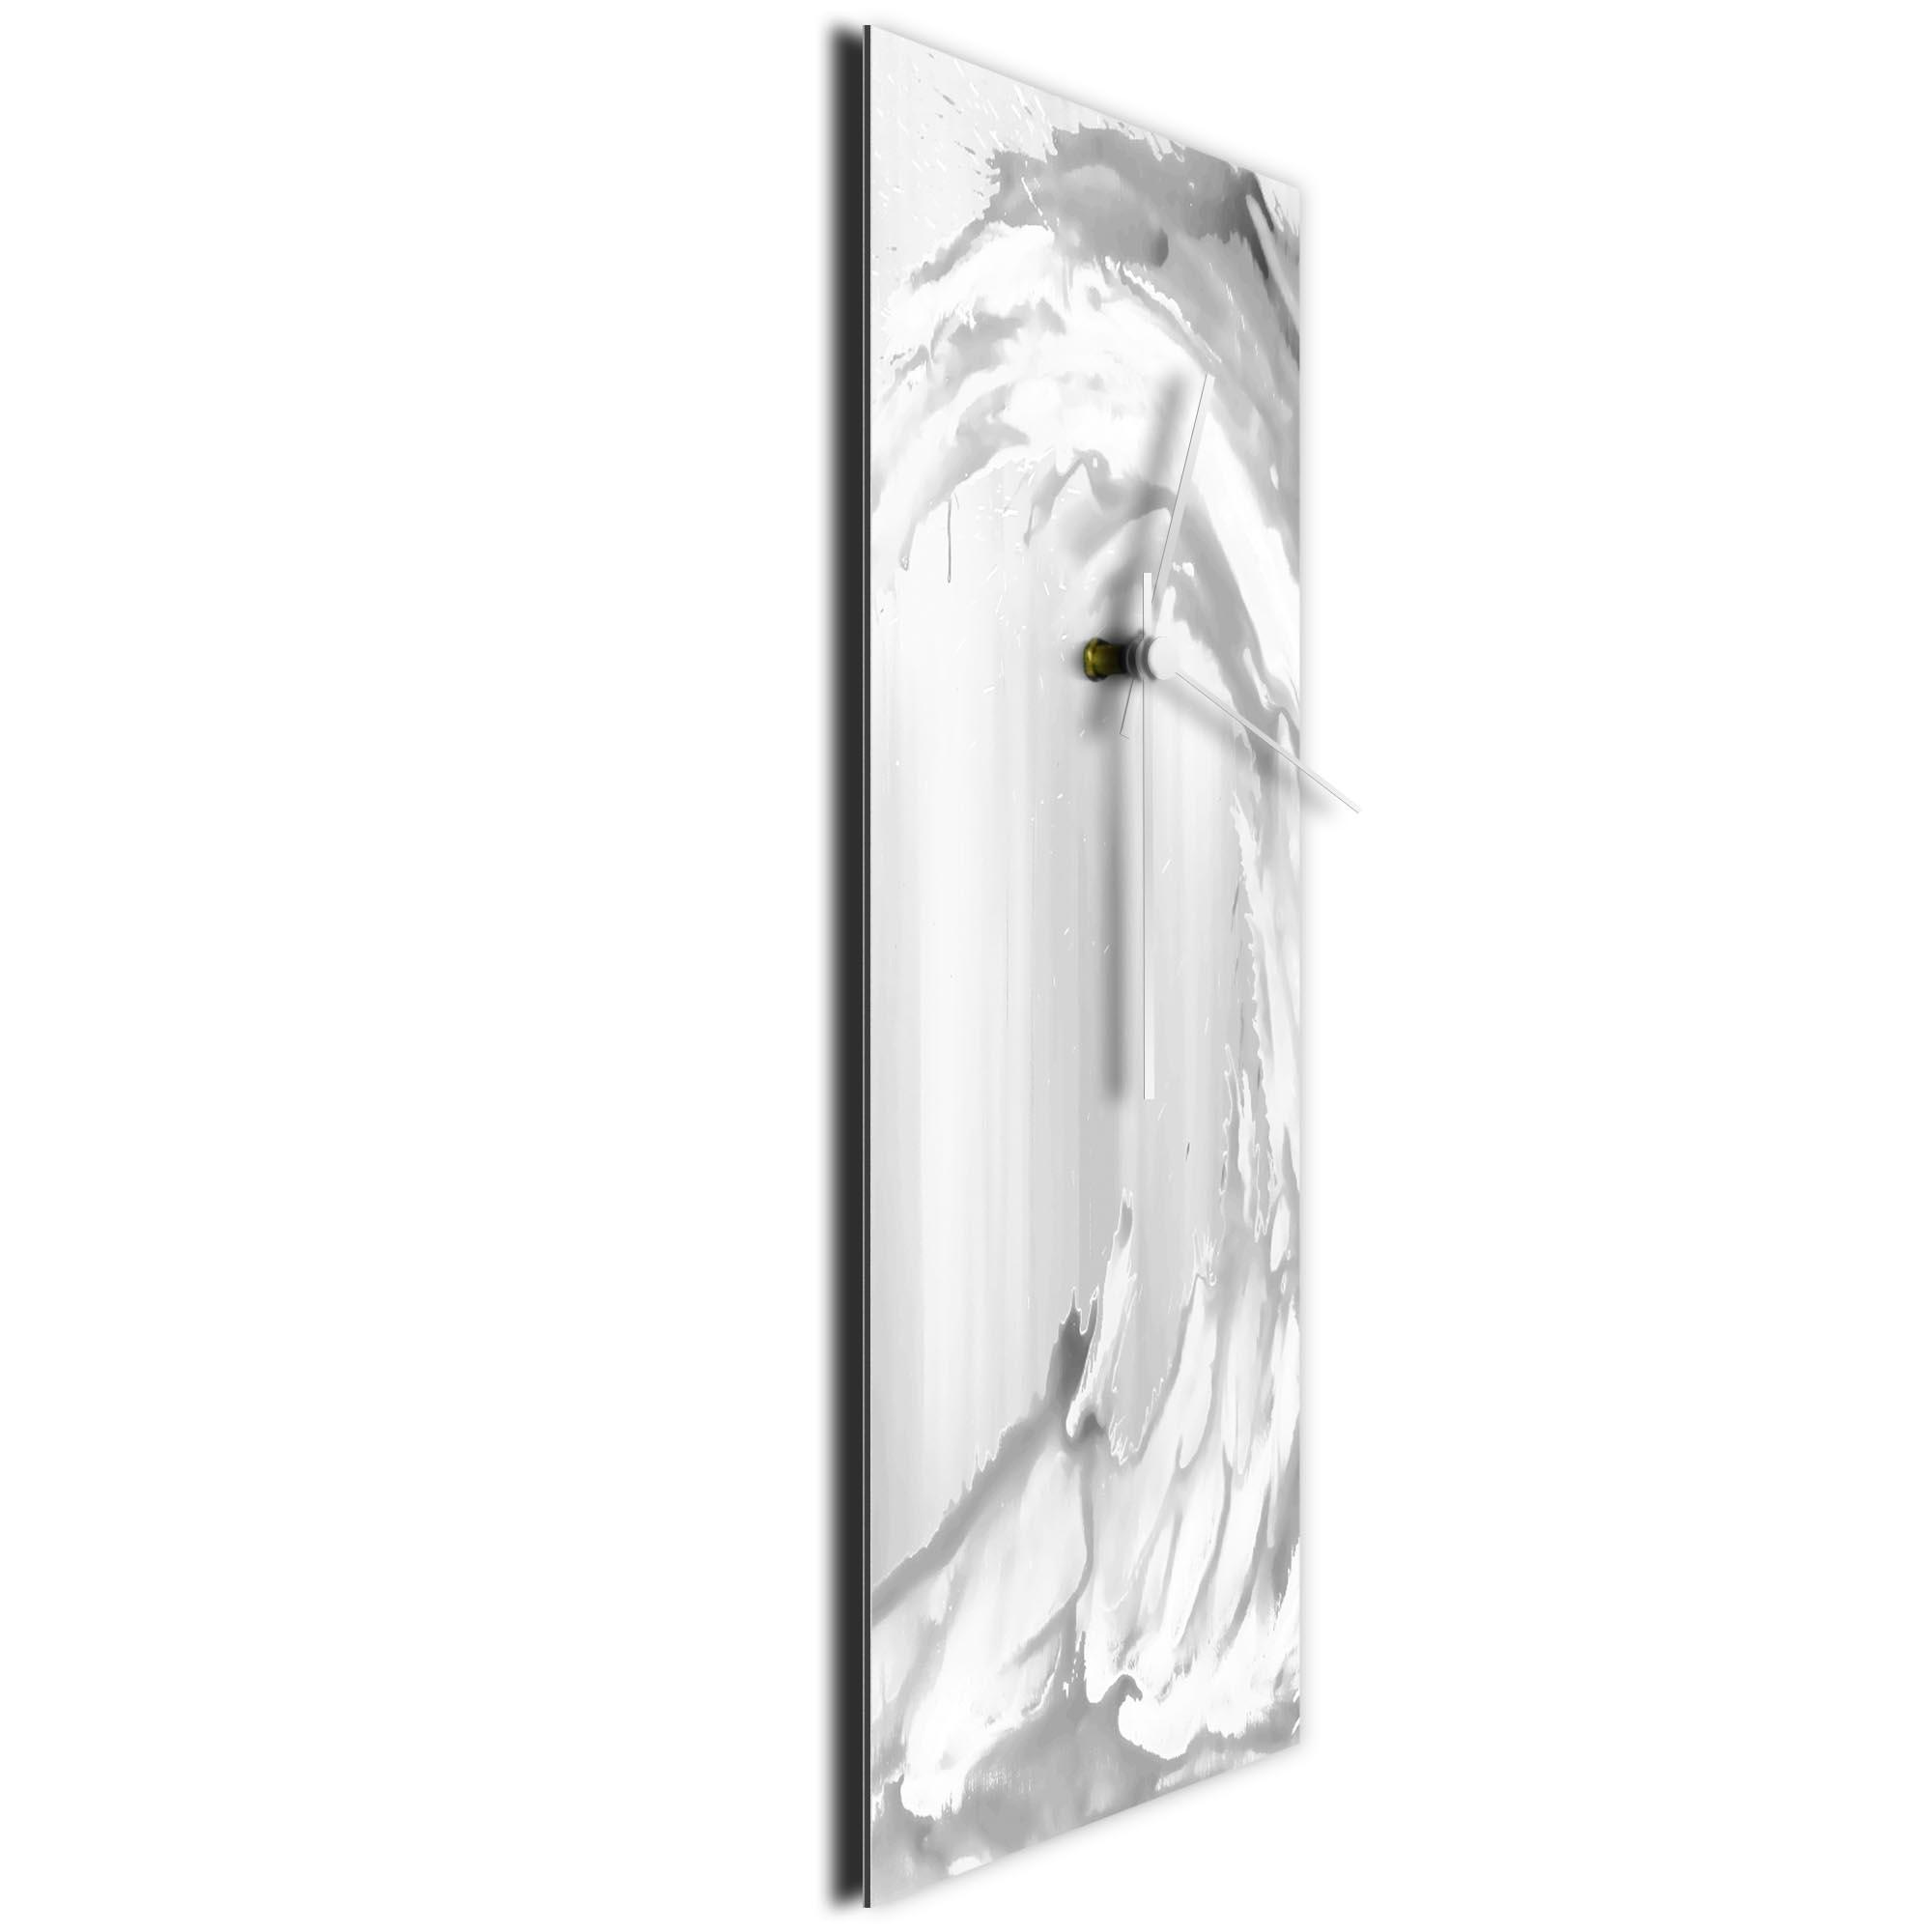 White Wave v2 Clock Large by Mendo Vasilevski - Urban Abstract Home Decor - Image 3